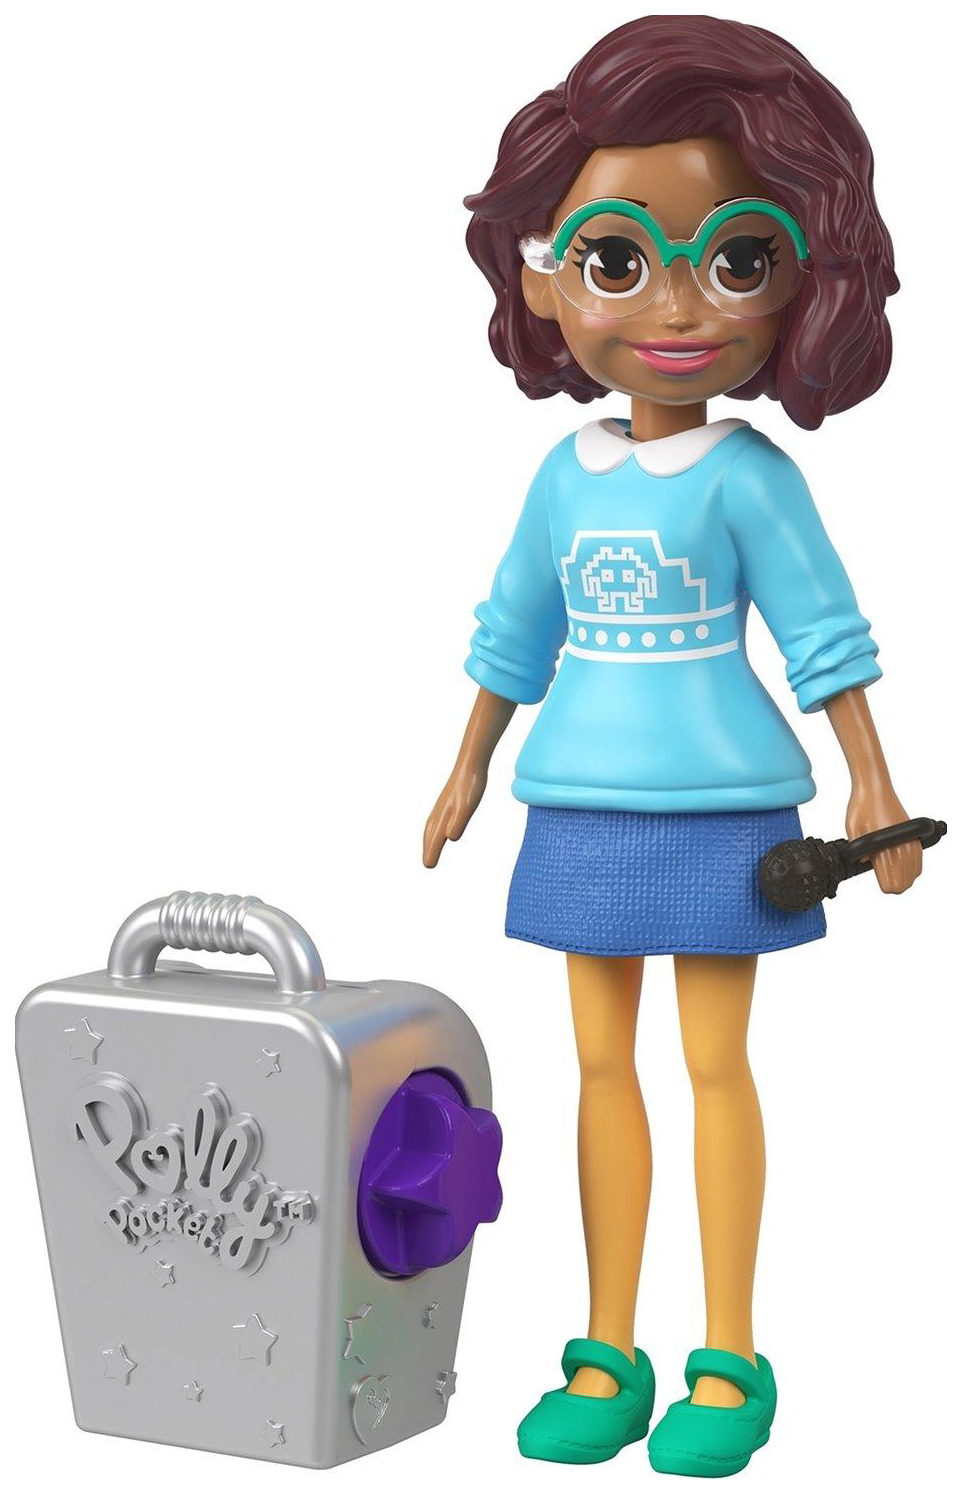 Кукла Polly Pocket Королева караоке Шани